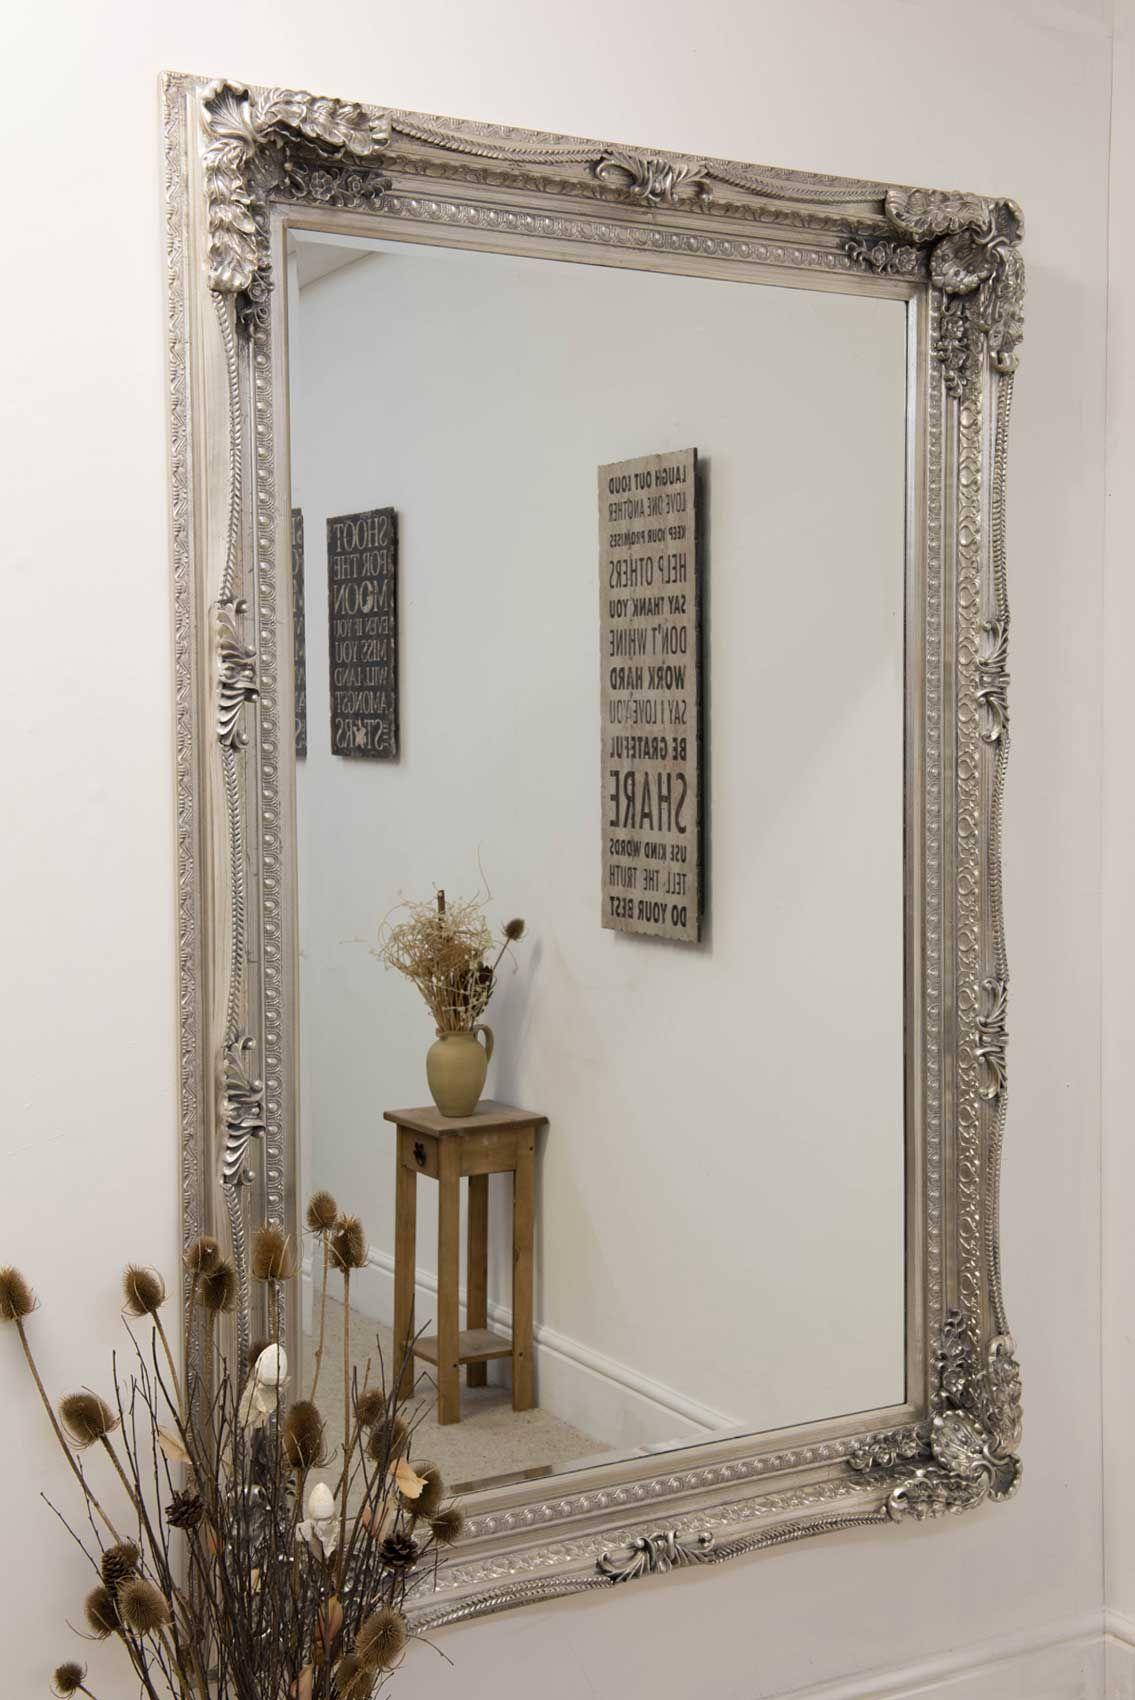 Charlton Silver Framed Mirror 123x175cm | Frame mirrors, Mirrors ...